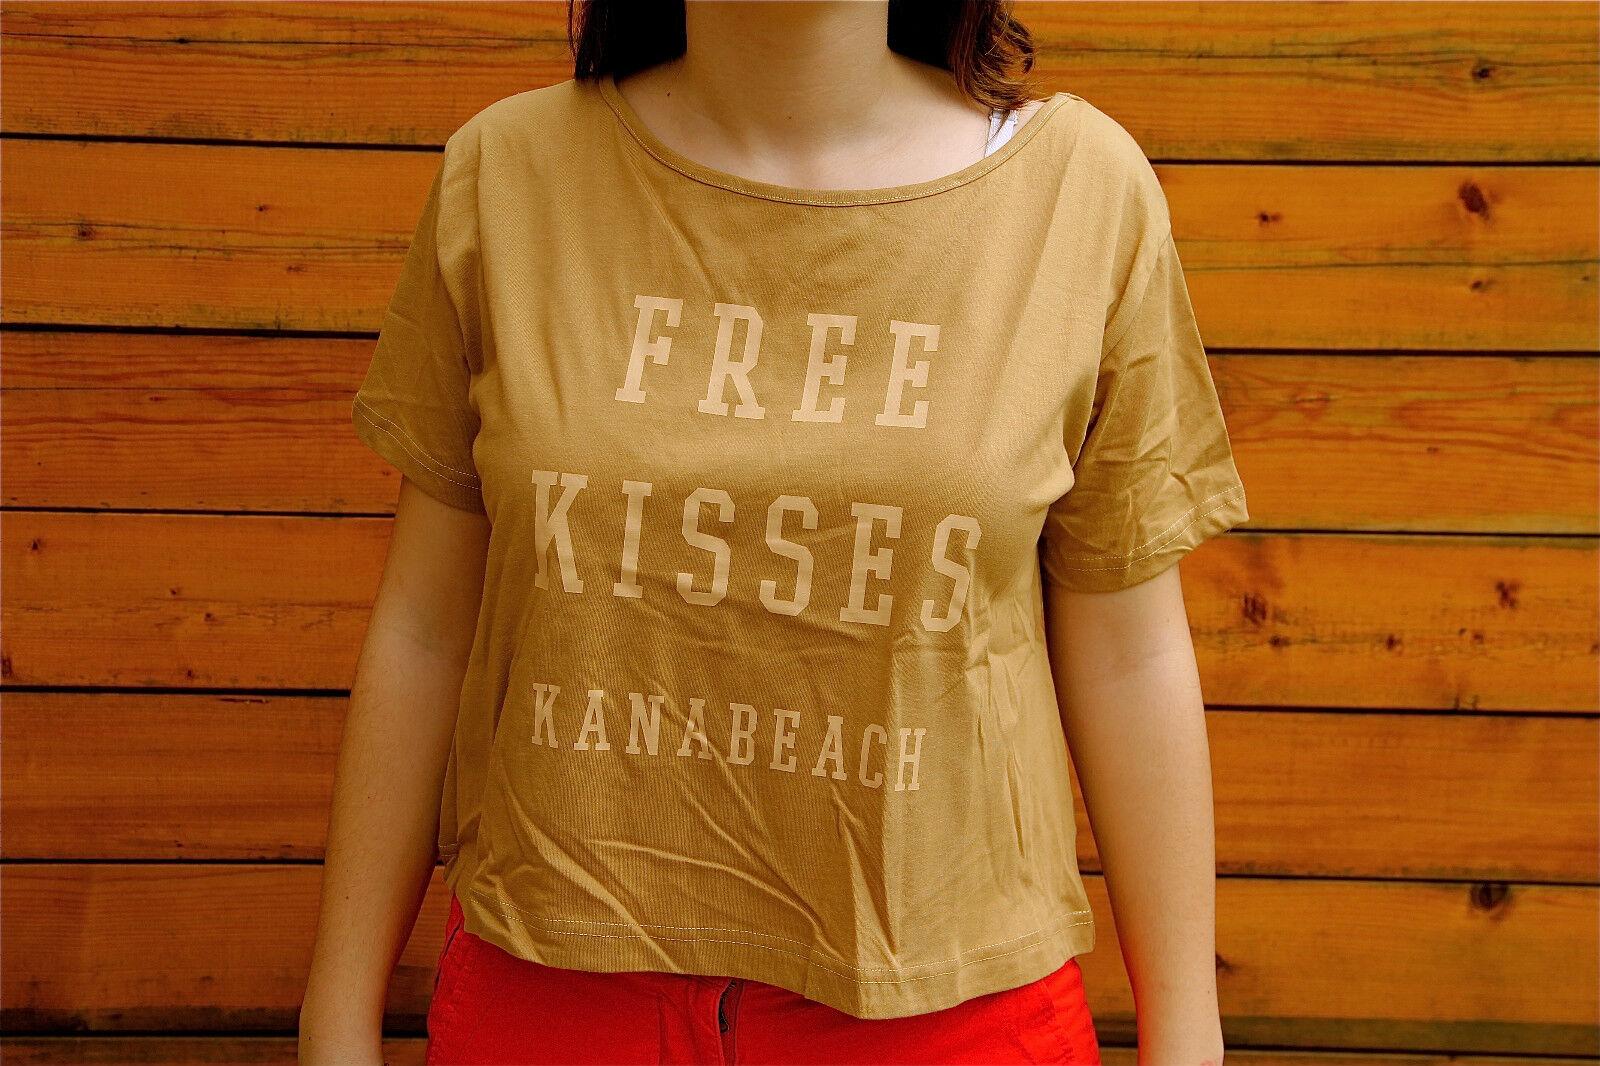 Camiseta Camel Kanabeach Biologik Angel T 38 Nuevo con Etiqueta Valor